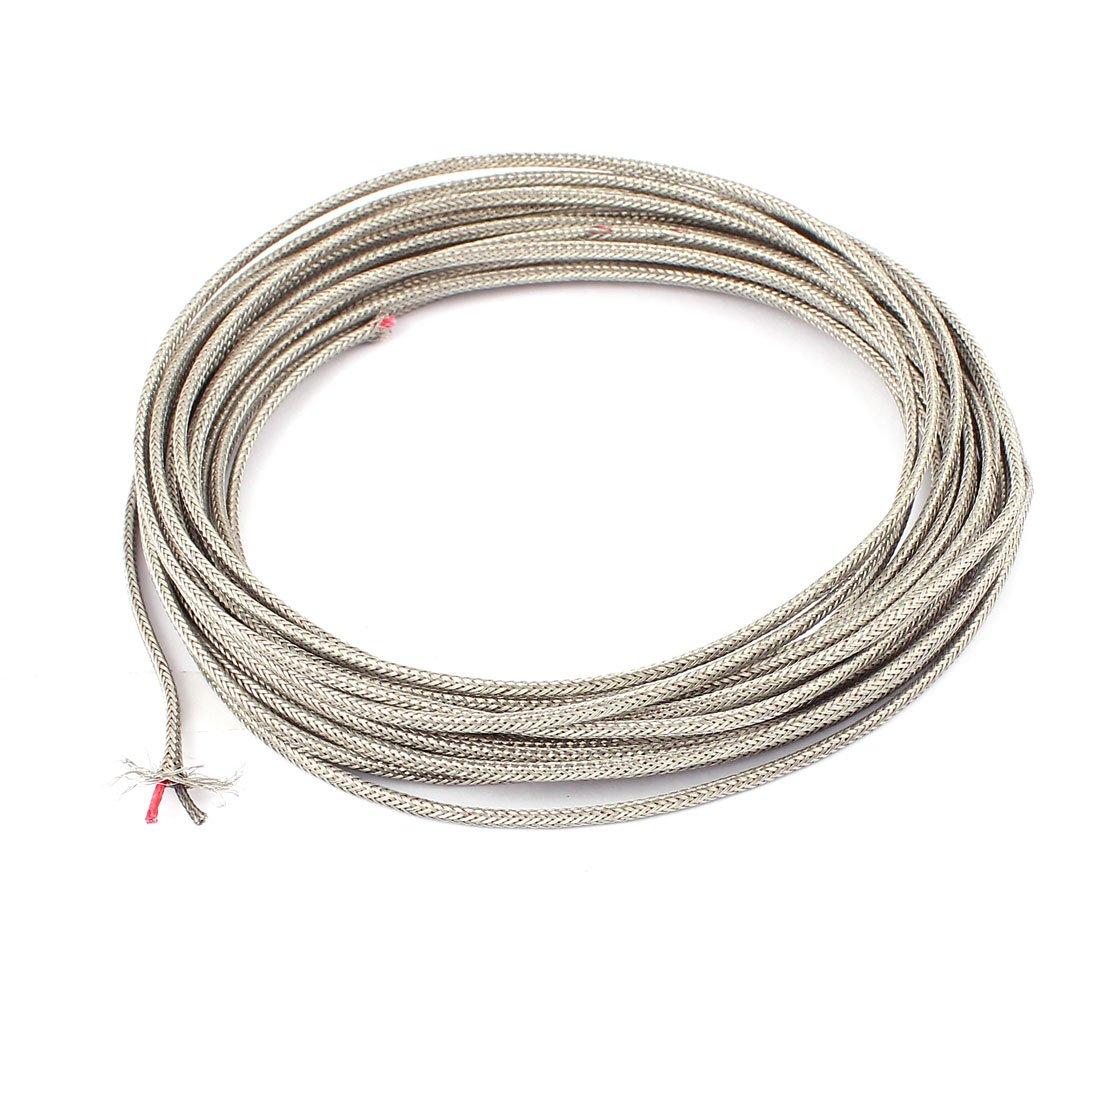 Uxcell Temperature Sensor Probe Tester K-Type Thermocouple Wire, 0.4 mm x 7.5 m